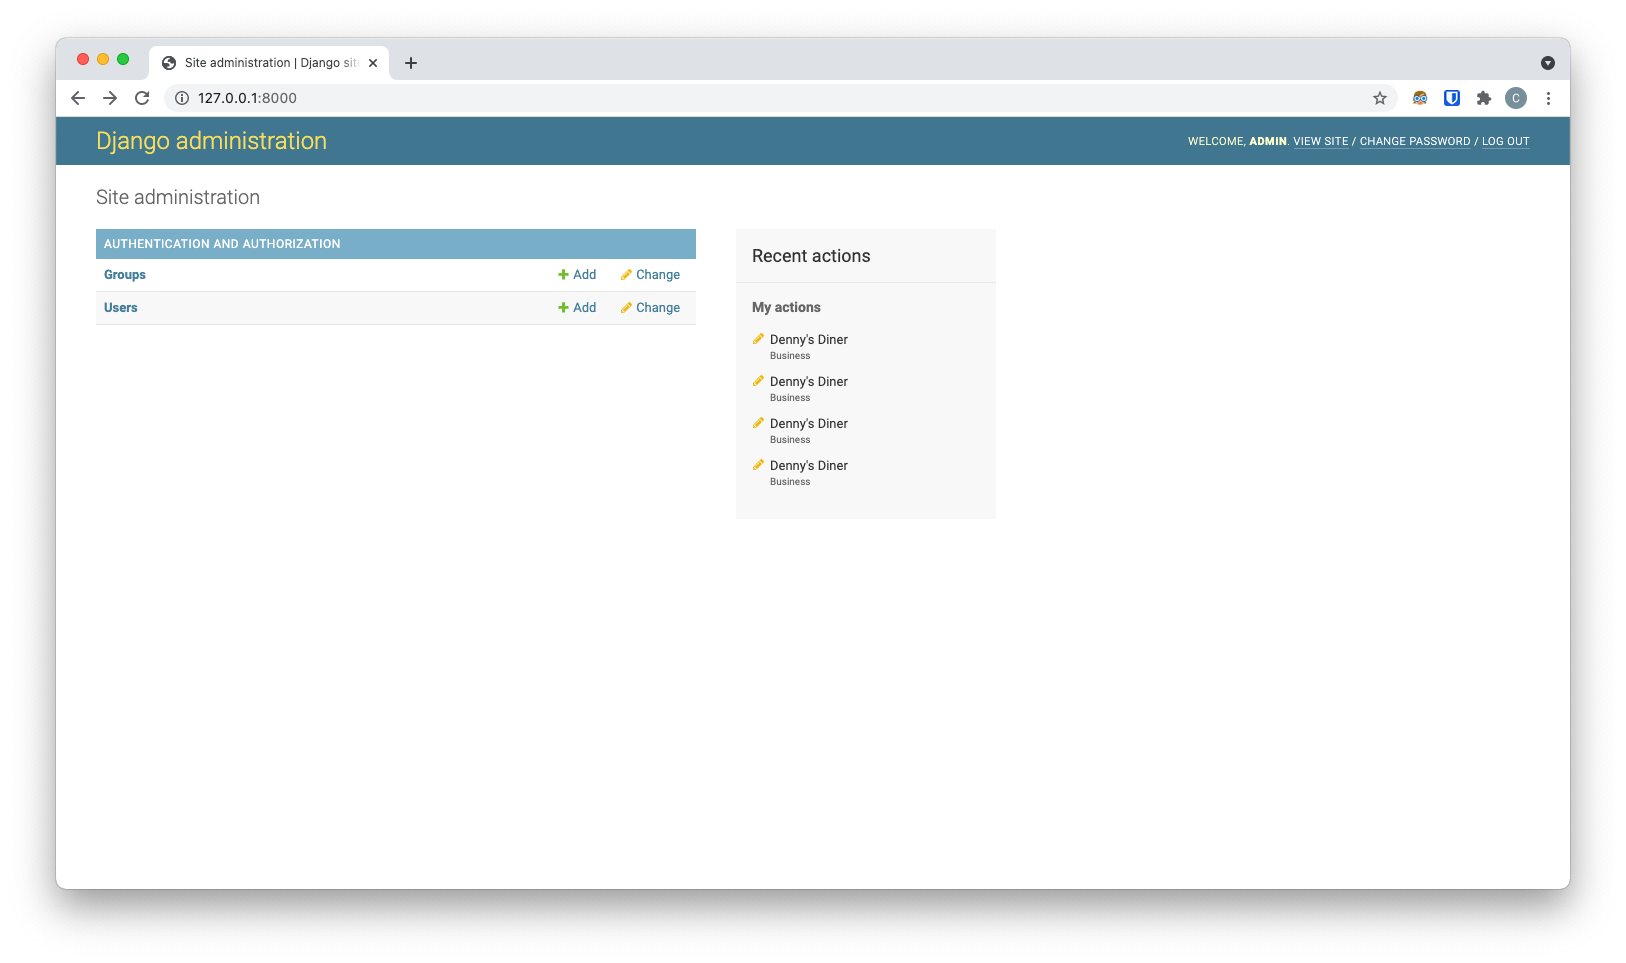 image showing admin dashboard